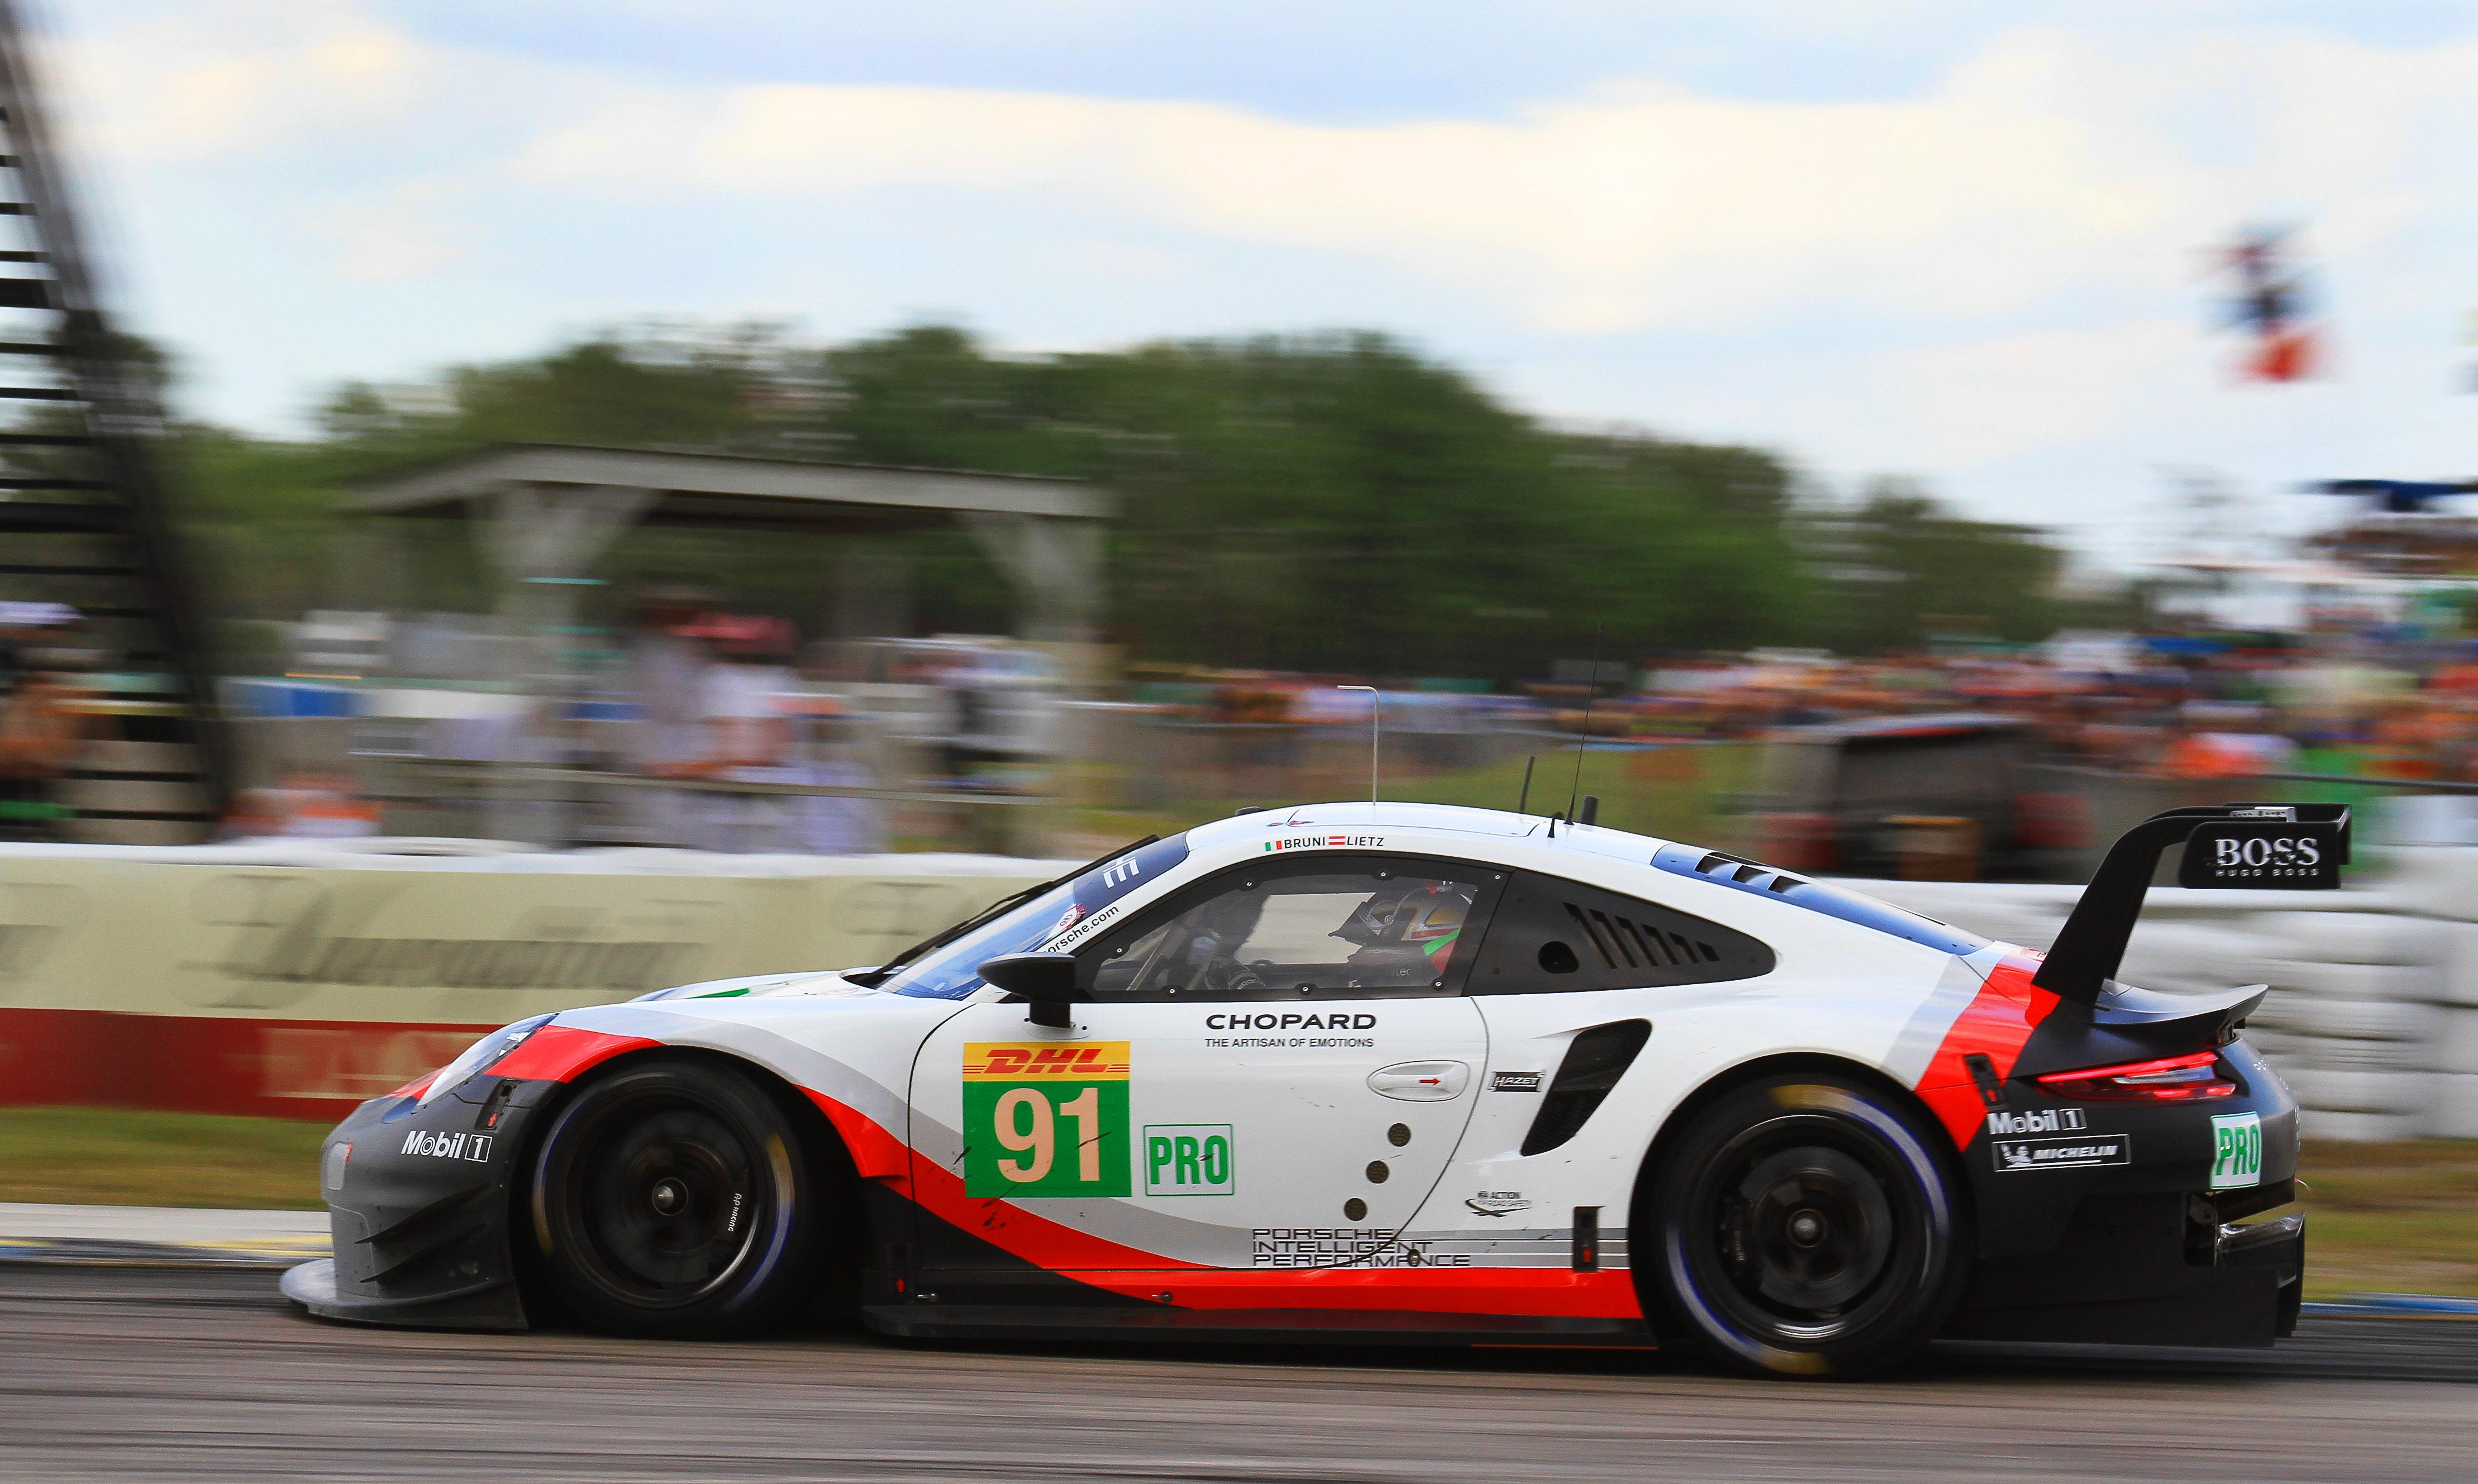 The #91 Porsche won GTE-Pro with fuel